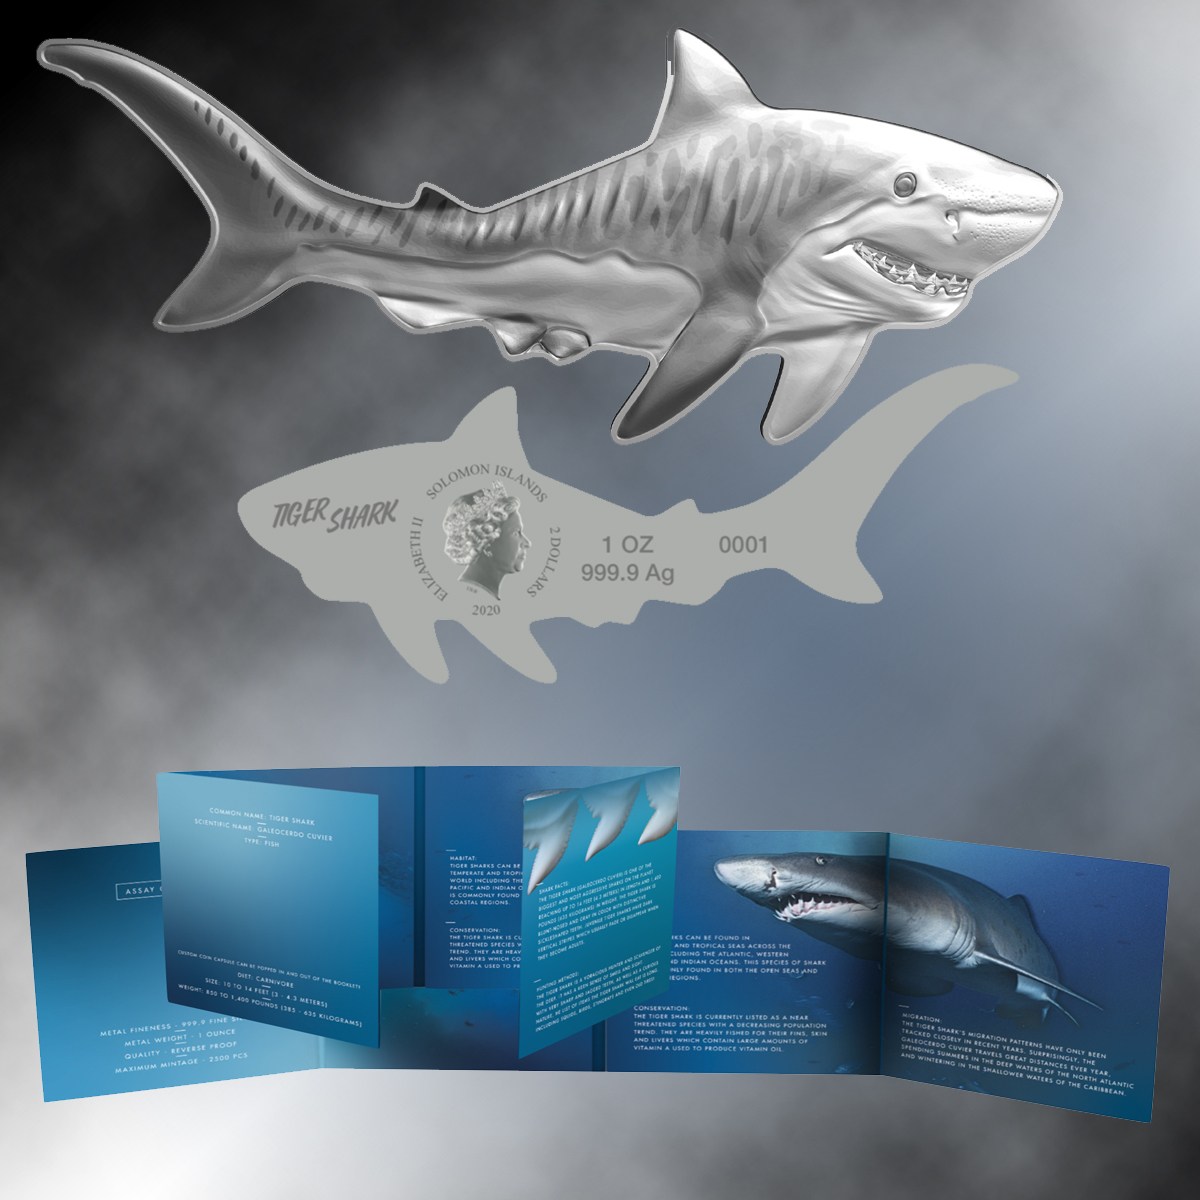 2020 Tiger Shark Shaped 1oz. Silver $2 Coin